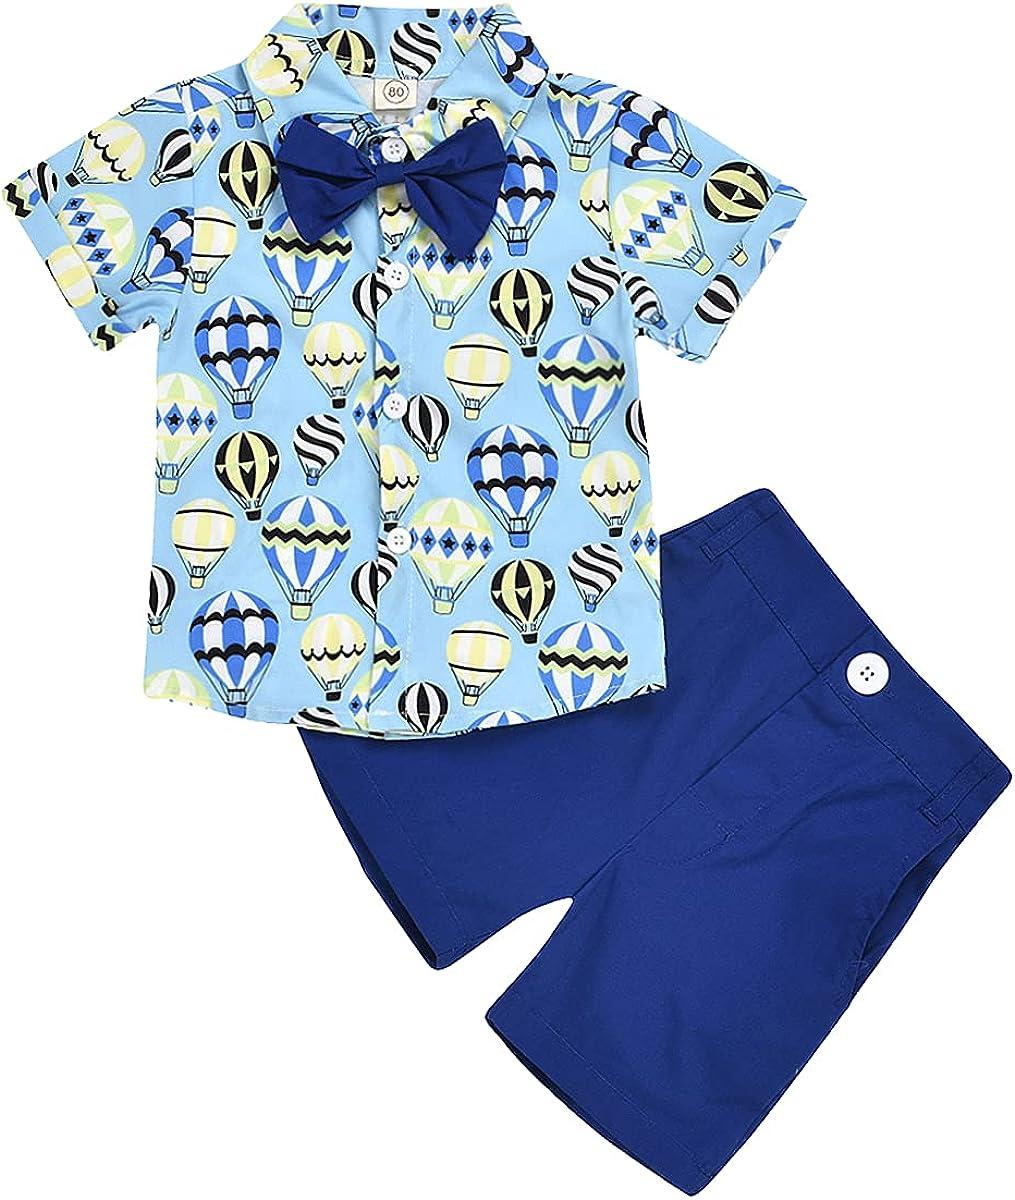 Baby Boy Cotton Clothing Short Sets Cartoon Print Short Sleeve Playwear Set 2Piece Summer Outfit